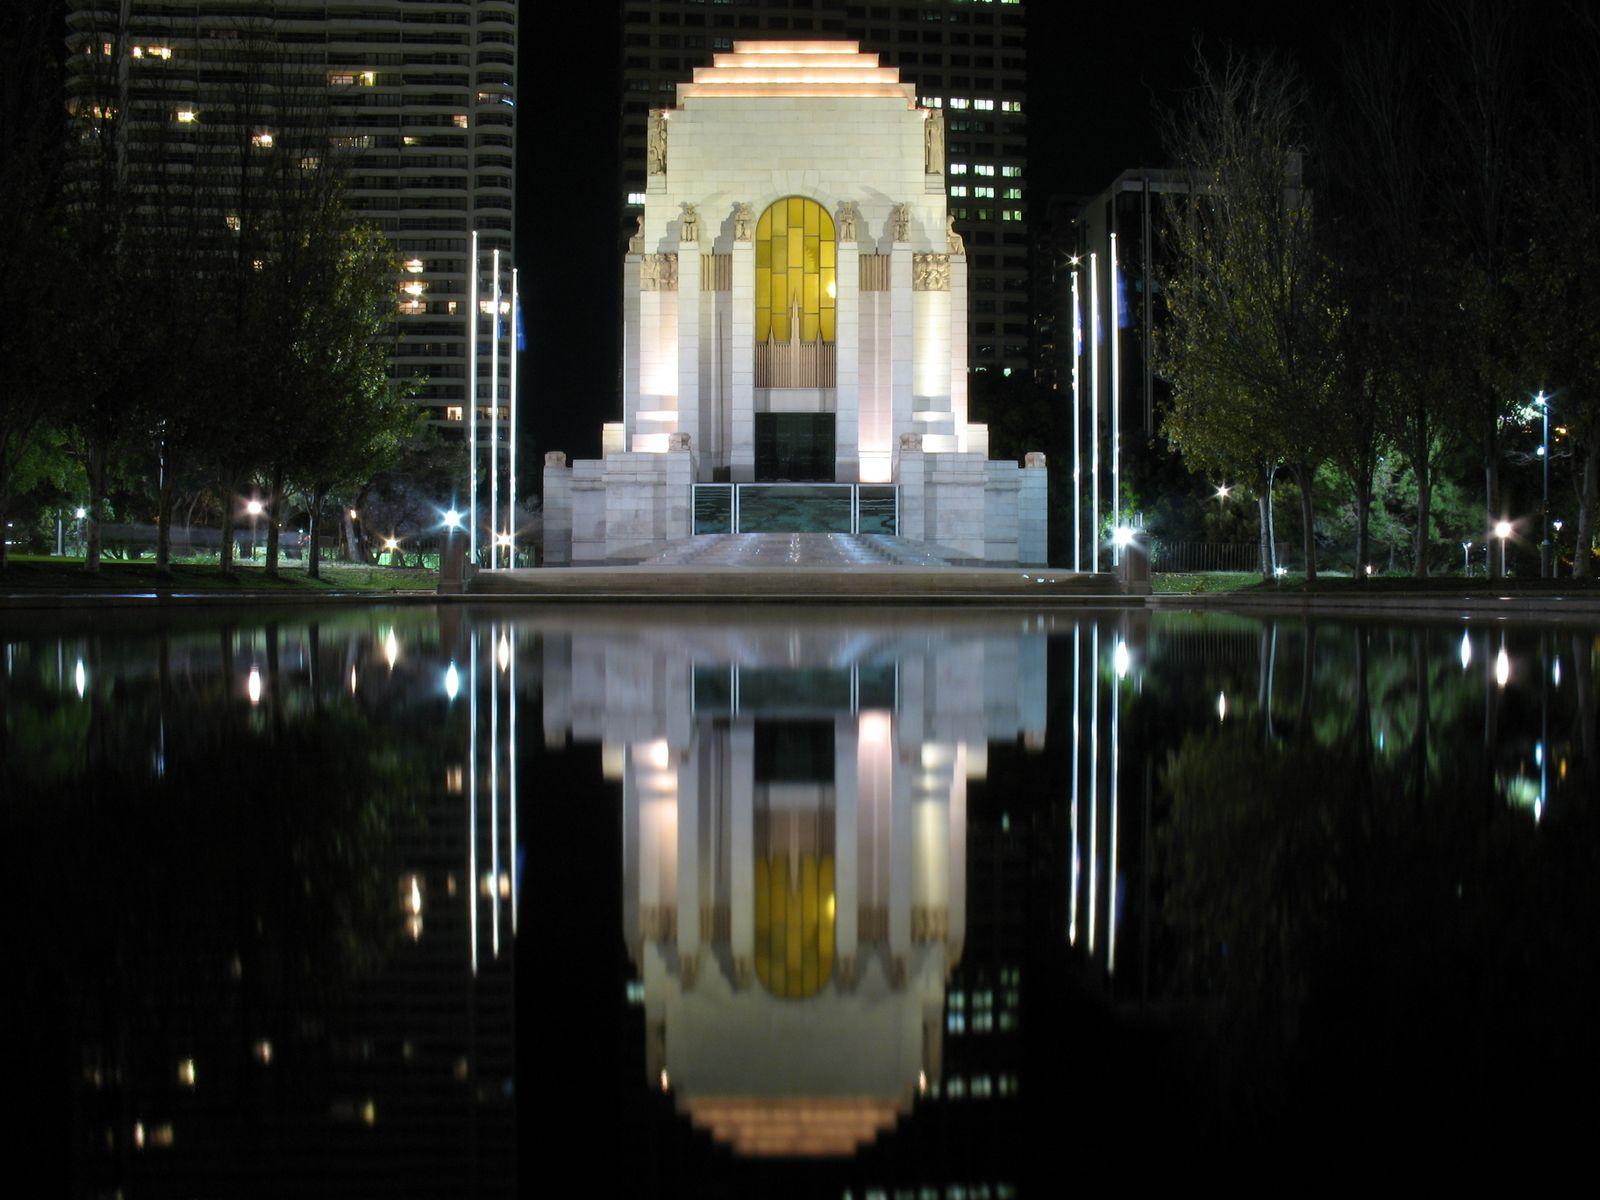 http://upload.wikimedia.org/wikipedia/commons/e/e1/ANZAC_Memorial_Sydney_Australia_-_June_2007.jpg